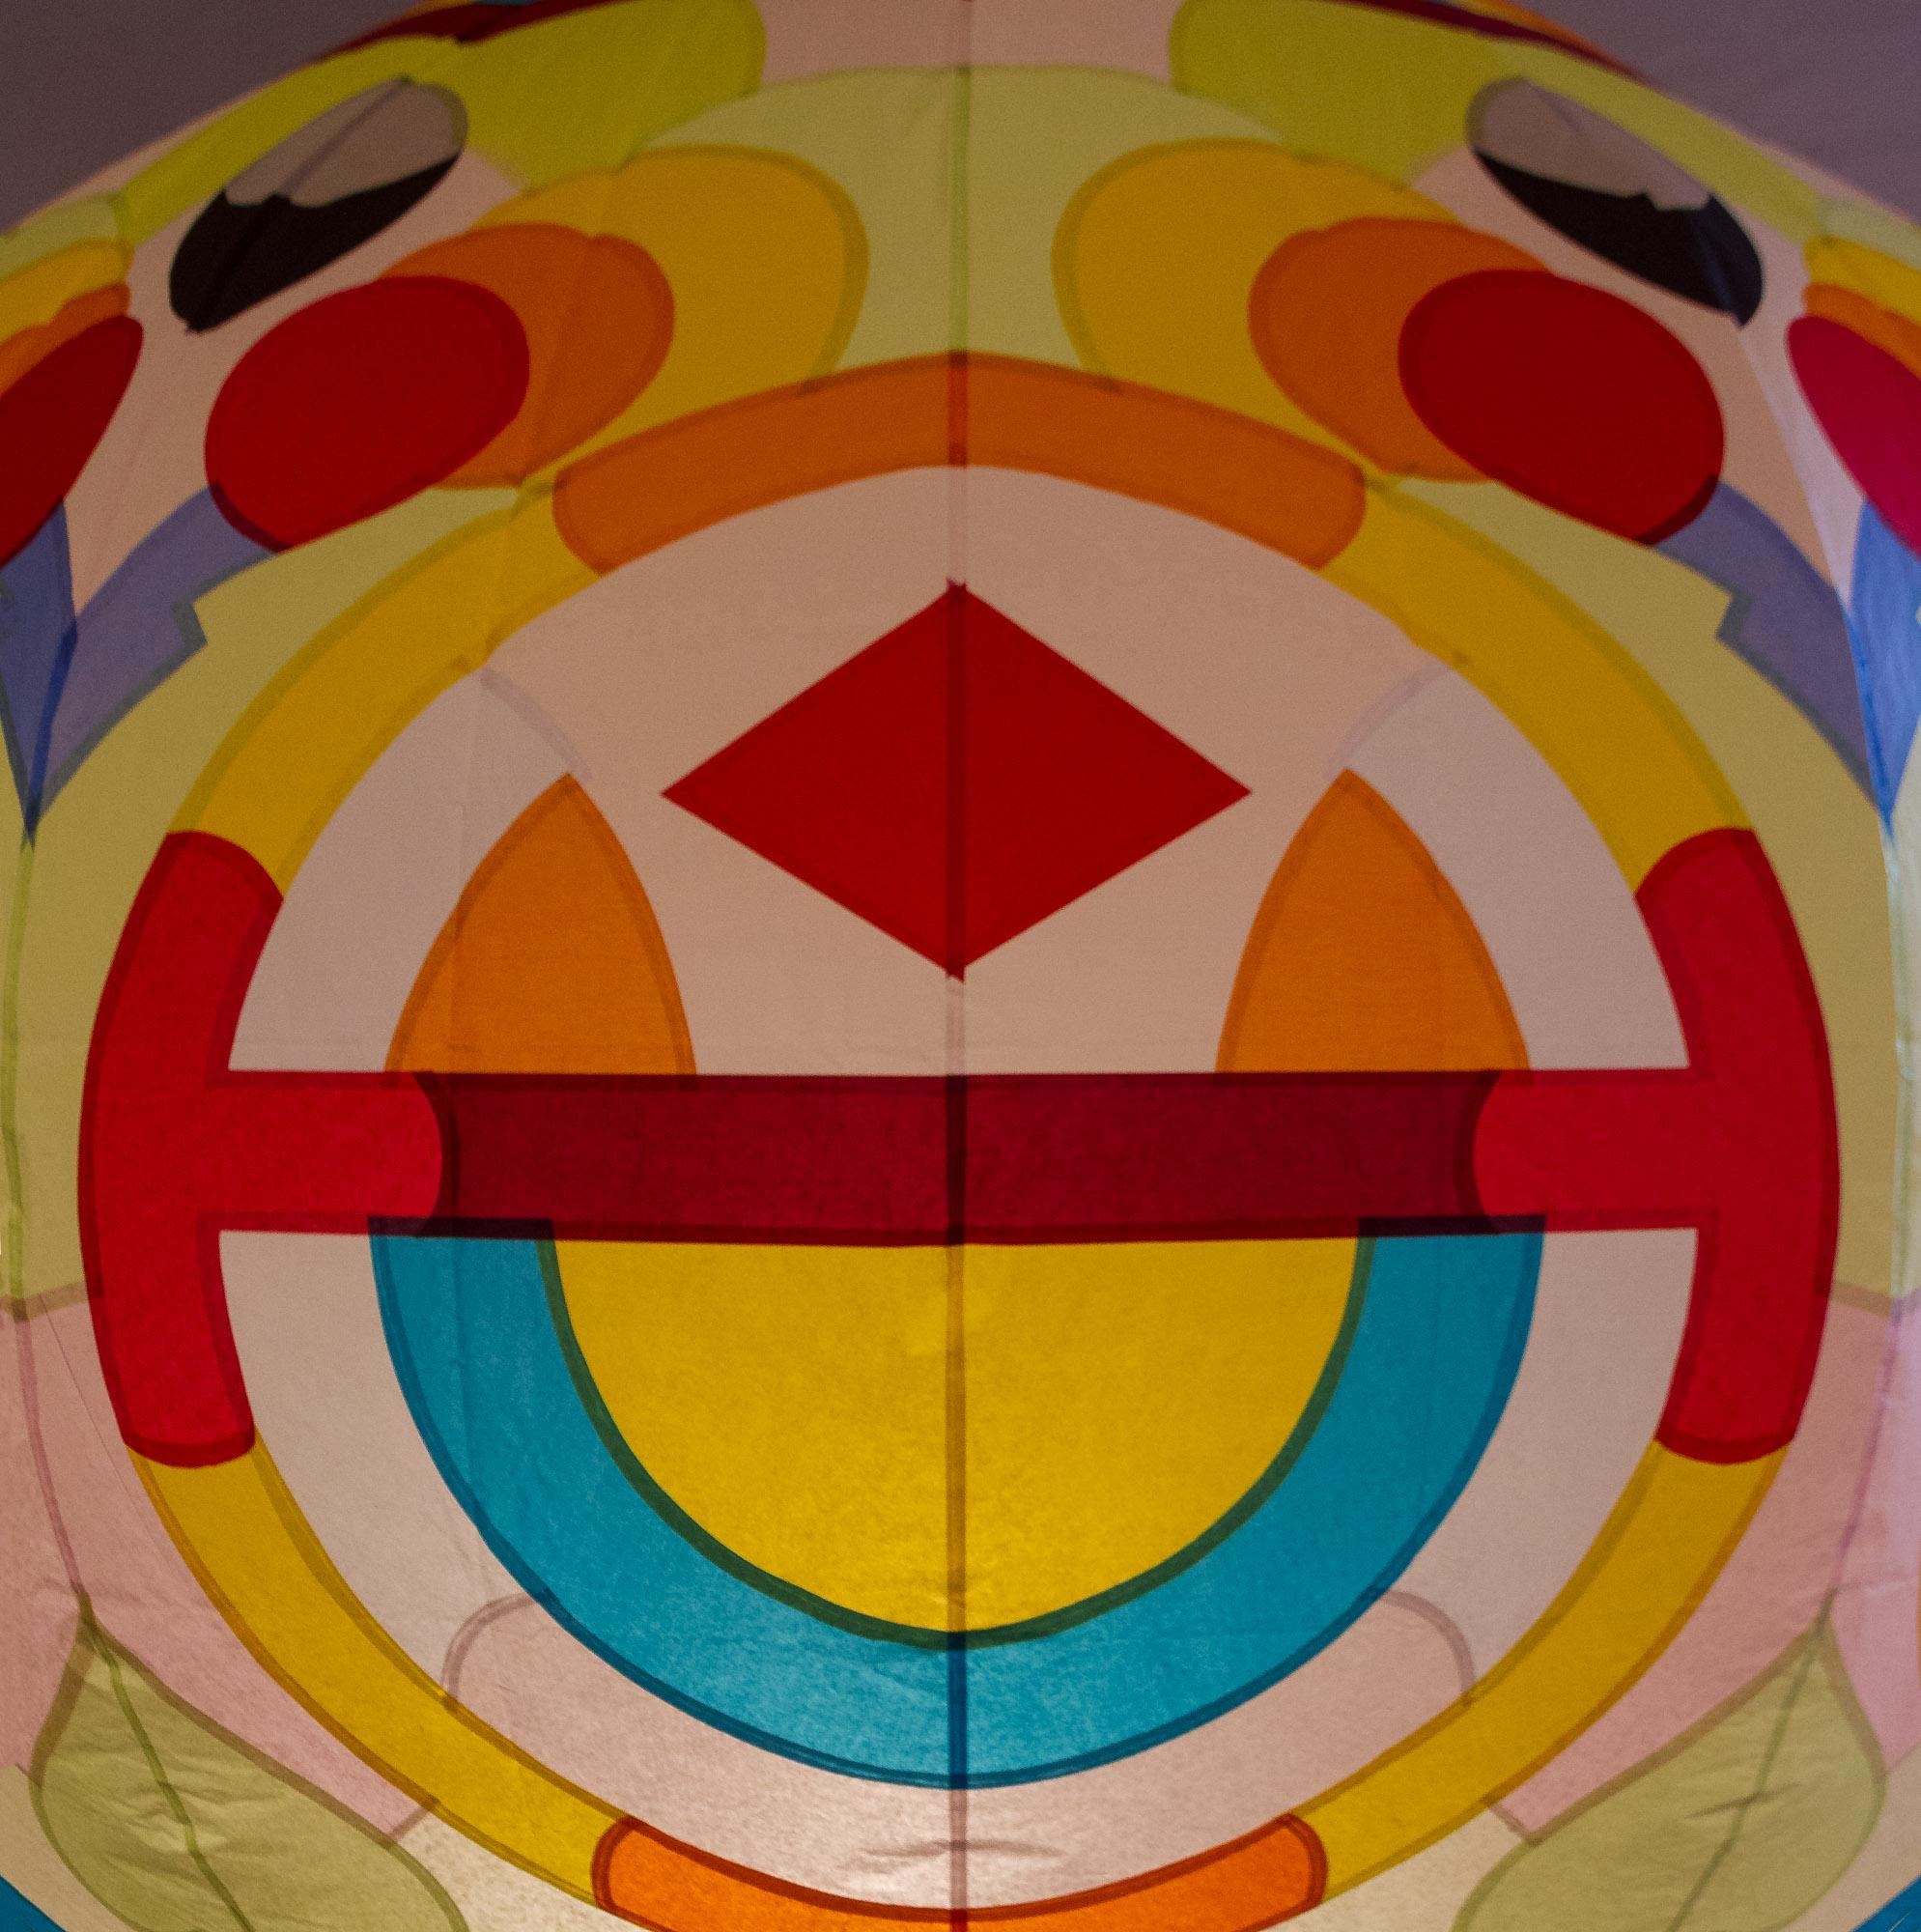 Color Wheel   CantoyaFest: Pátzcuaro, Michoacán, Mexico — Sunday, July 23, 2017